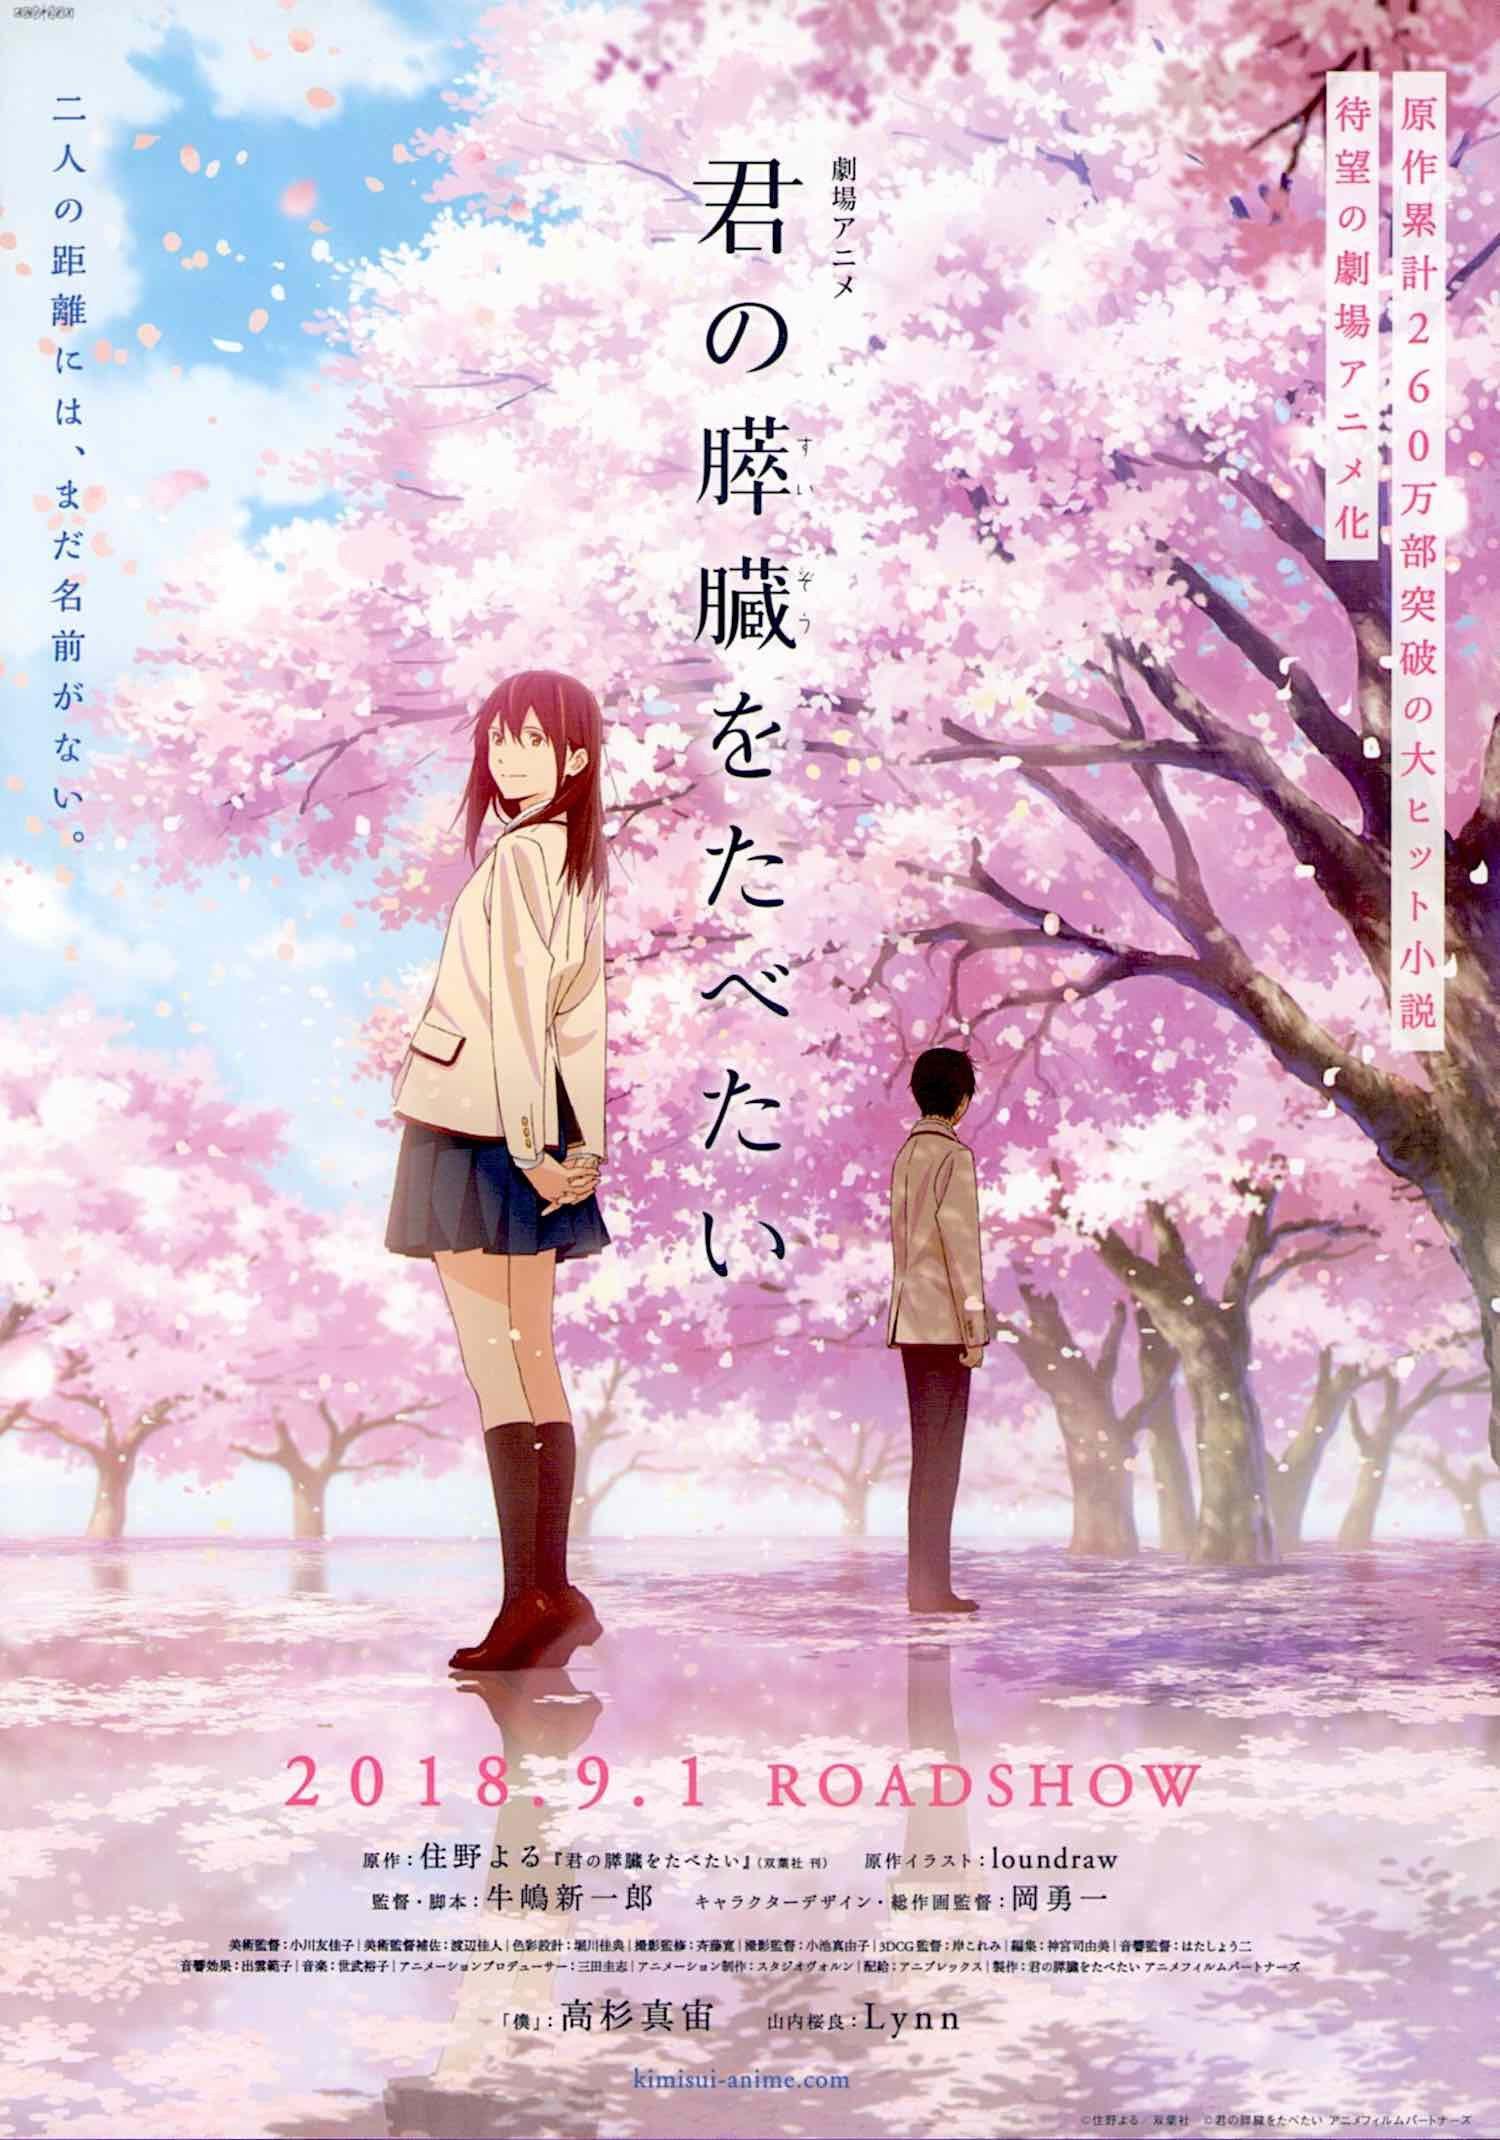 Pin En Anime Chirashi Posters